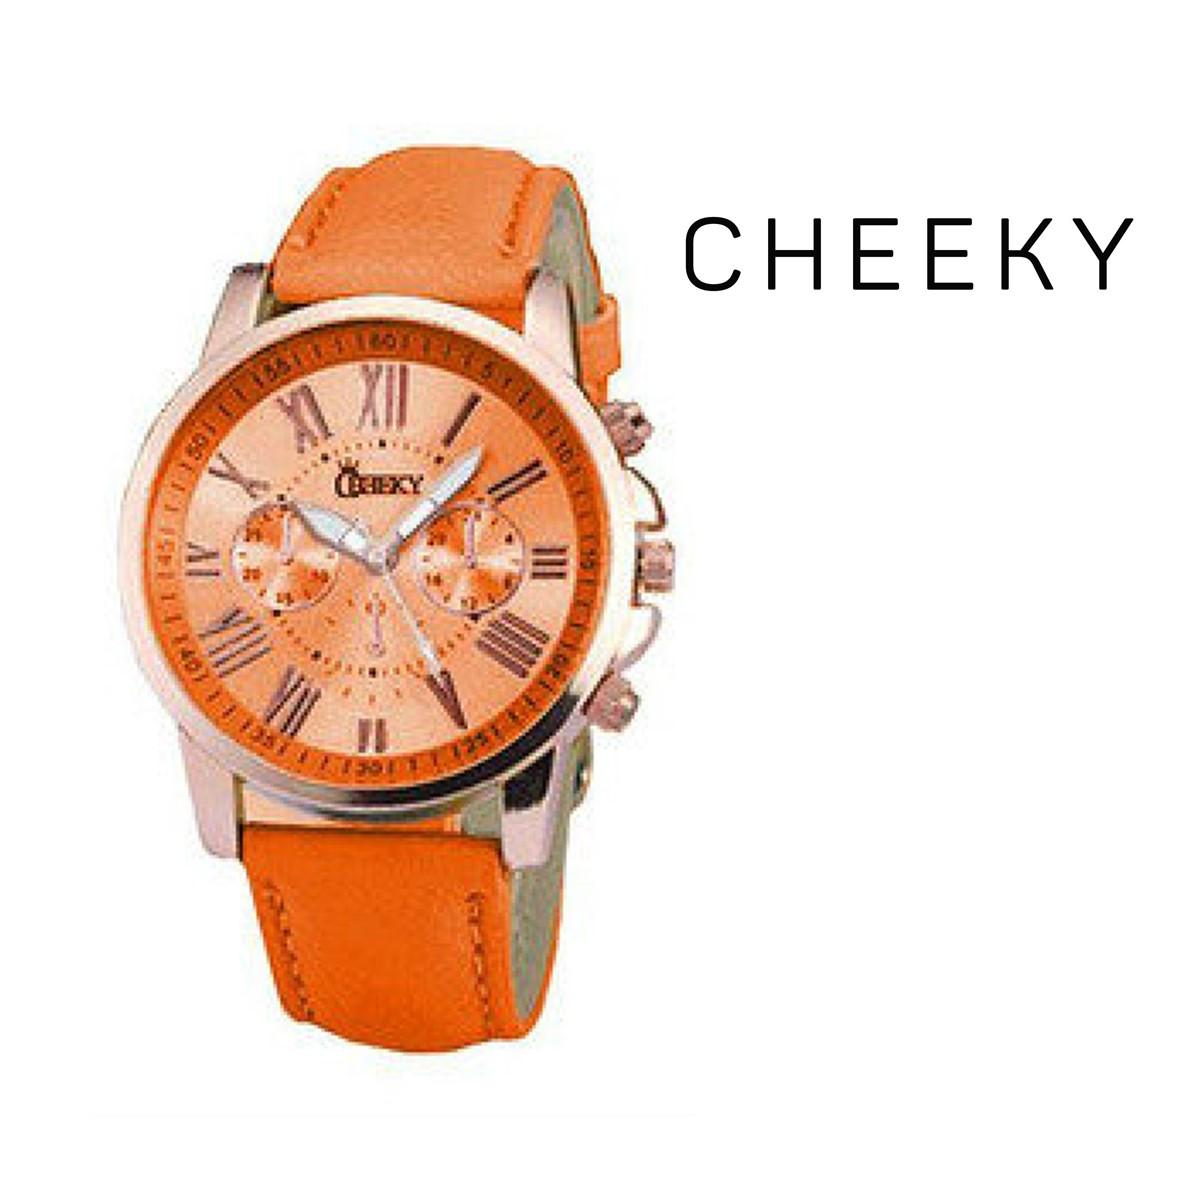 2cd9fdadf Reloj Cheeky Orange | Movimiento Seiko - You Like It